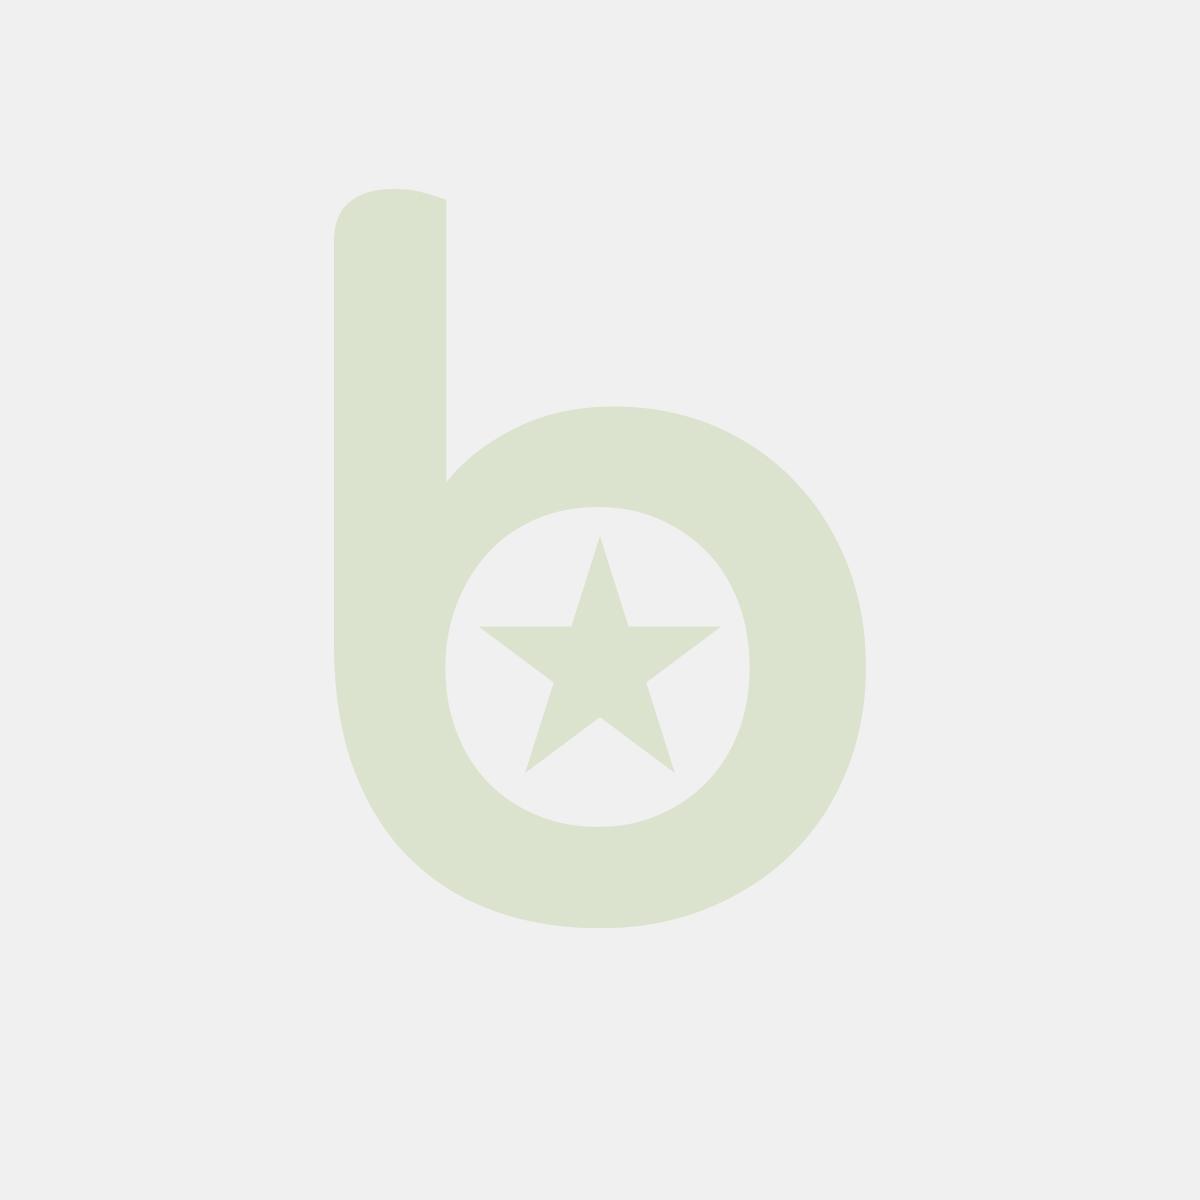 Serwetki PAPSTAR Royal Collection 40x40 terakota opakowanie 50szt